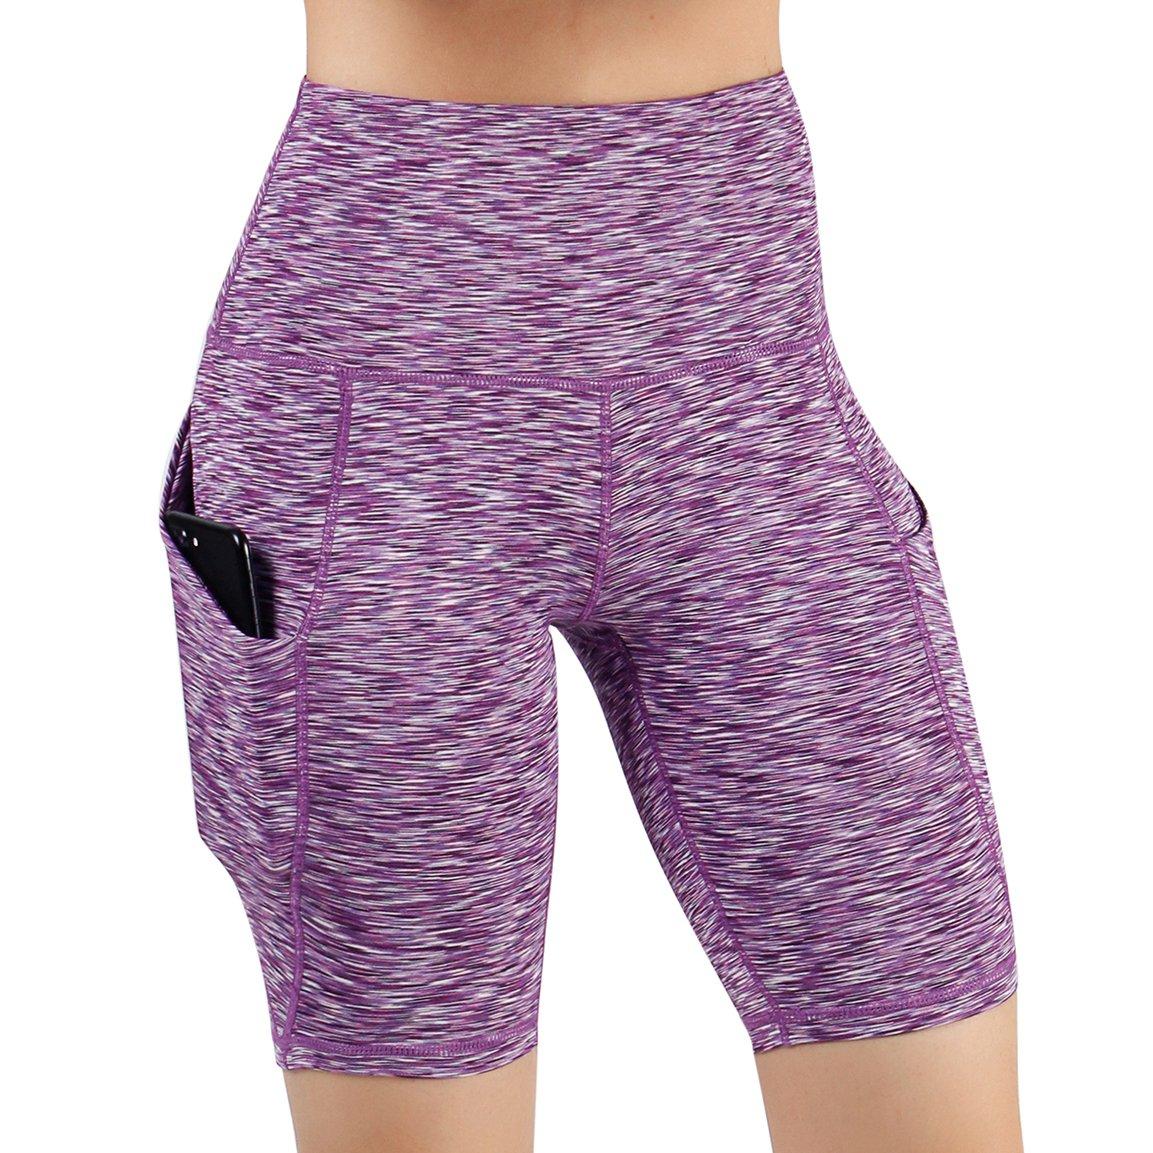 Yogapocketshots626spacedyepurple ODODOS High Waist Out Pocket Yoga Short Tummy Control Workout Running Athletic Non SeeThrough Yoga Shorts